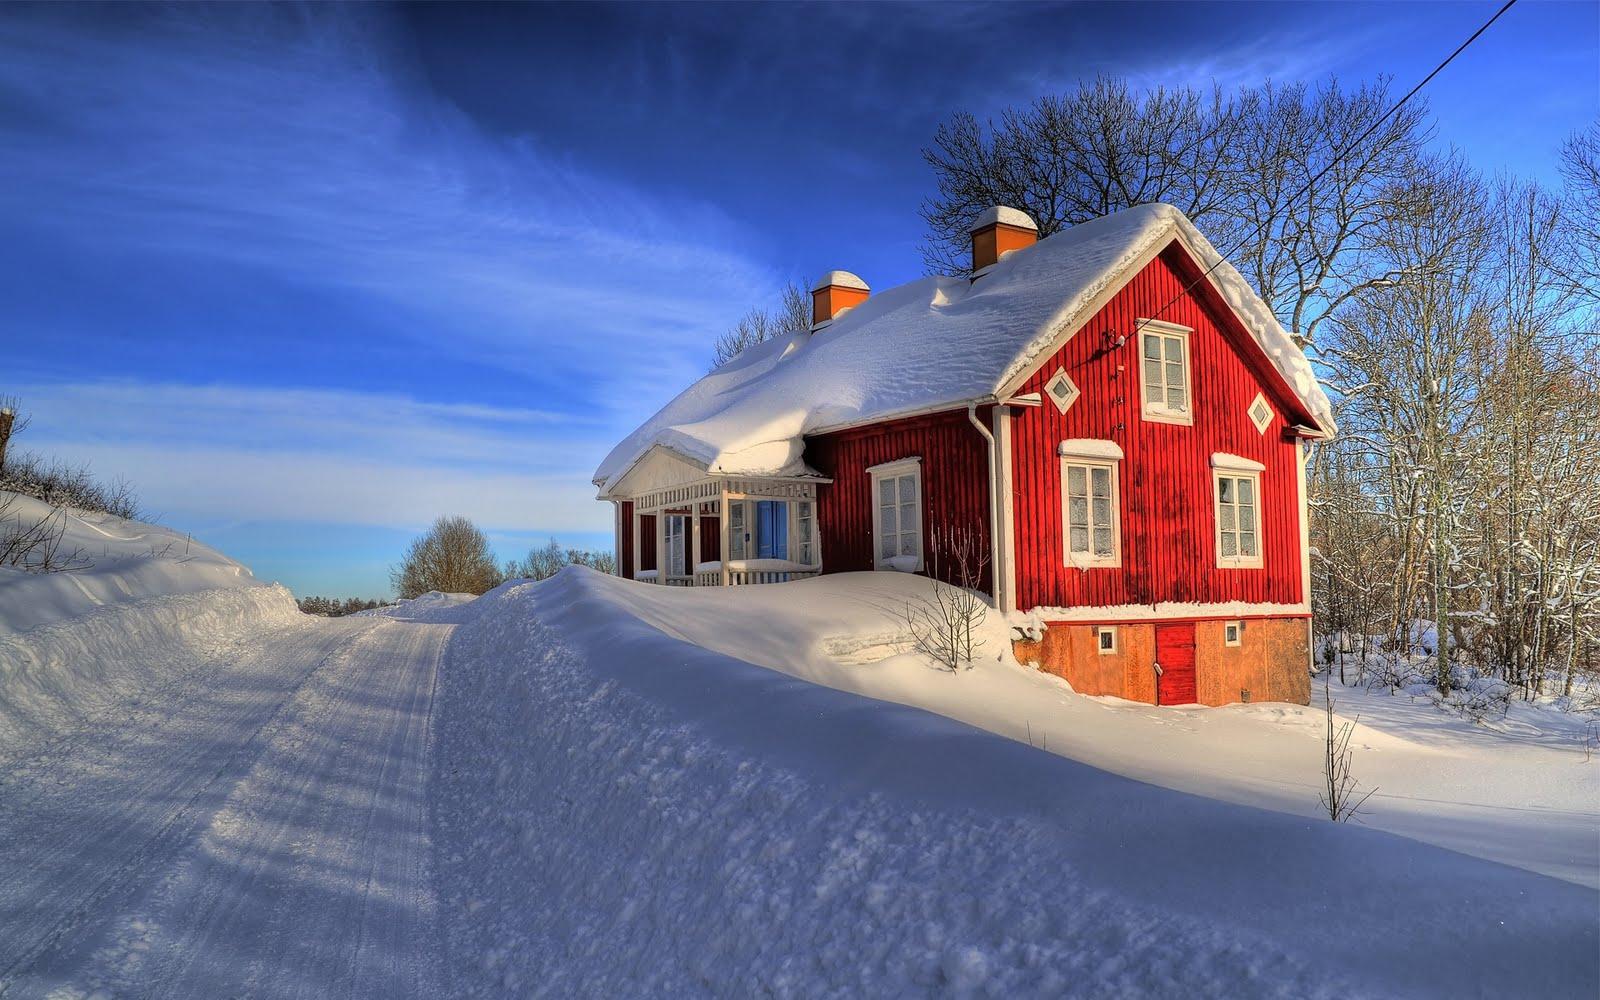 Casa entre la nieve. Paisajes con Nieve